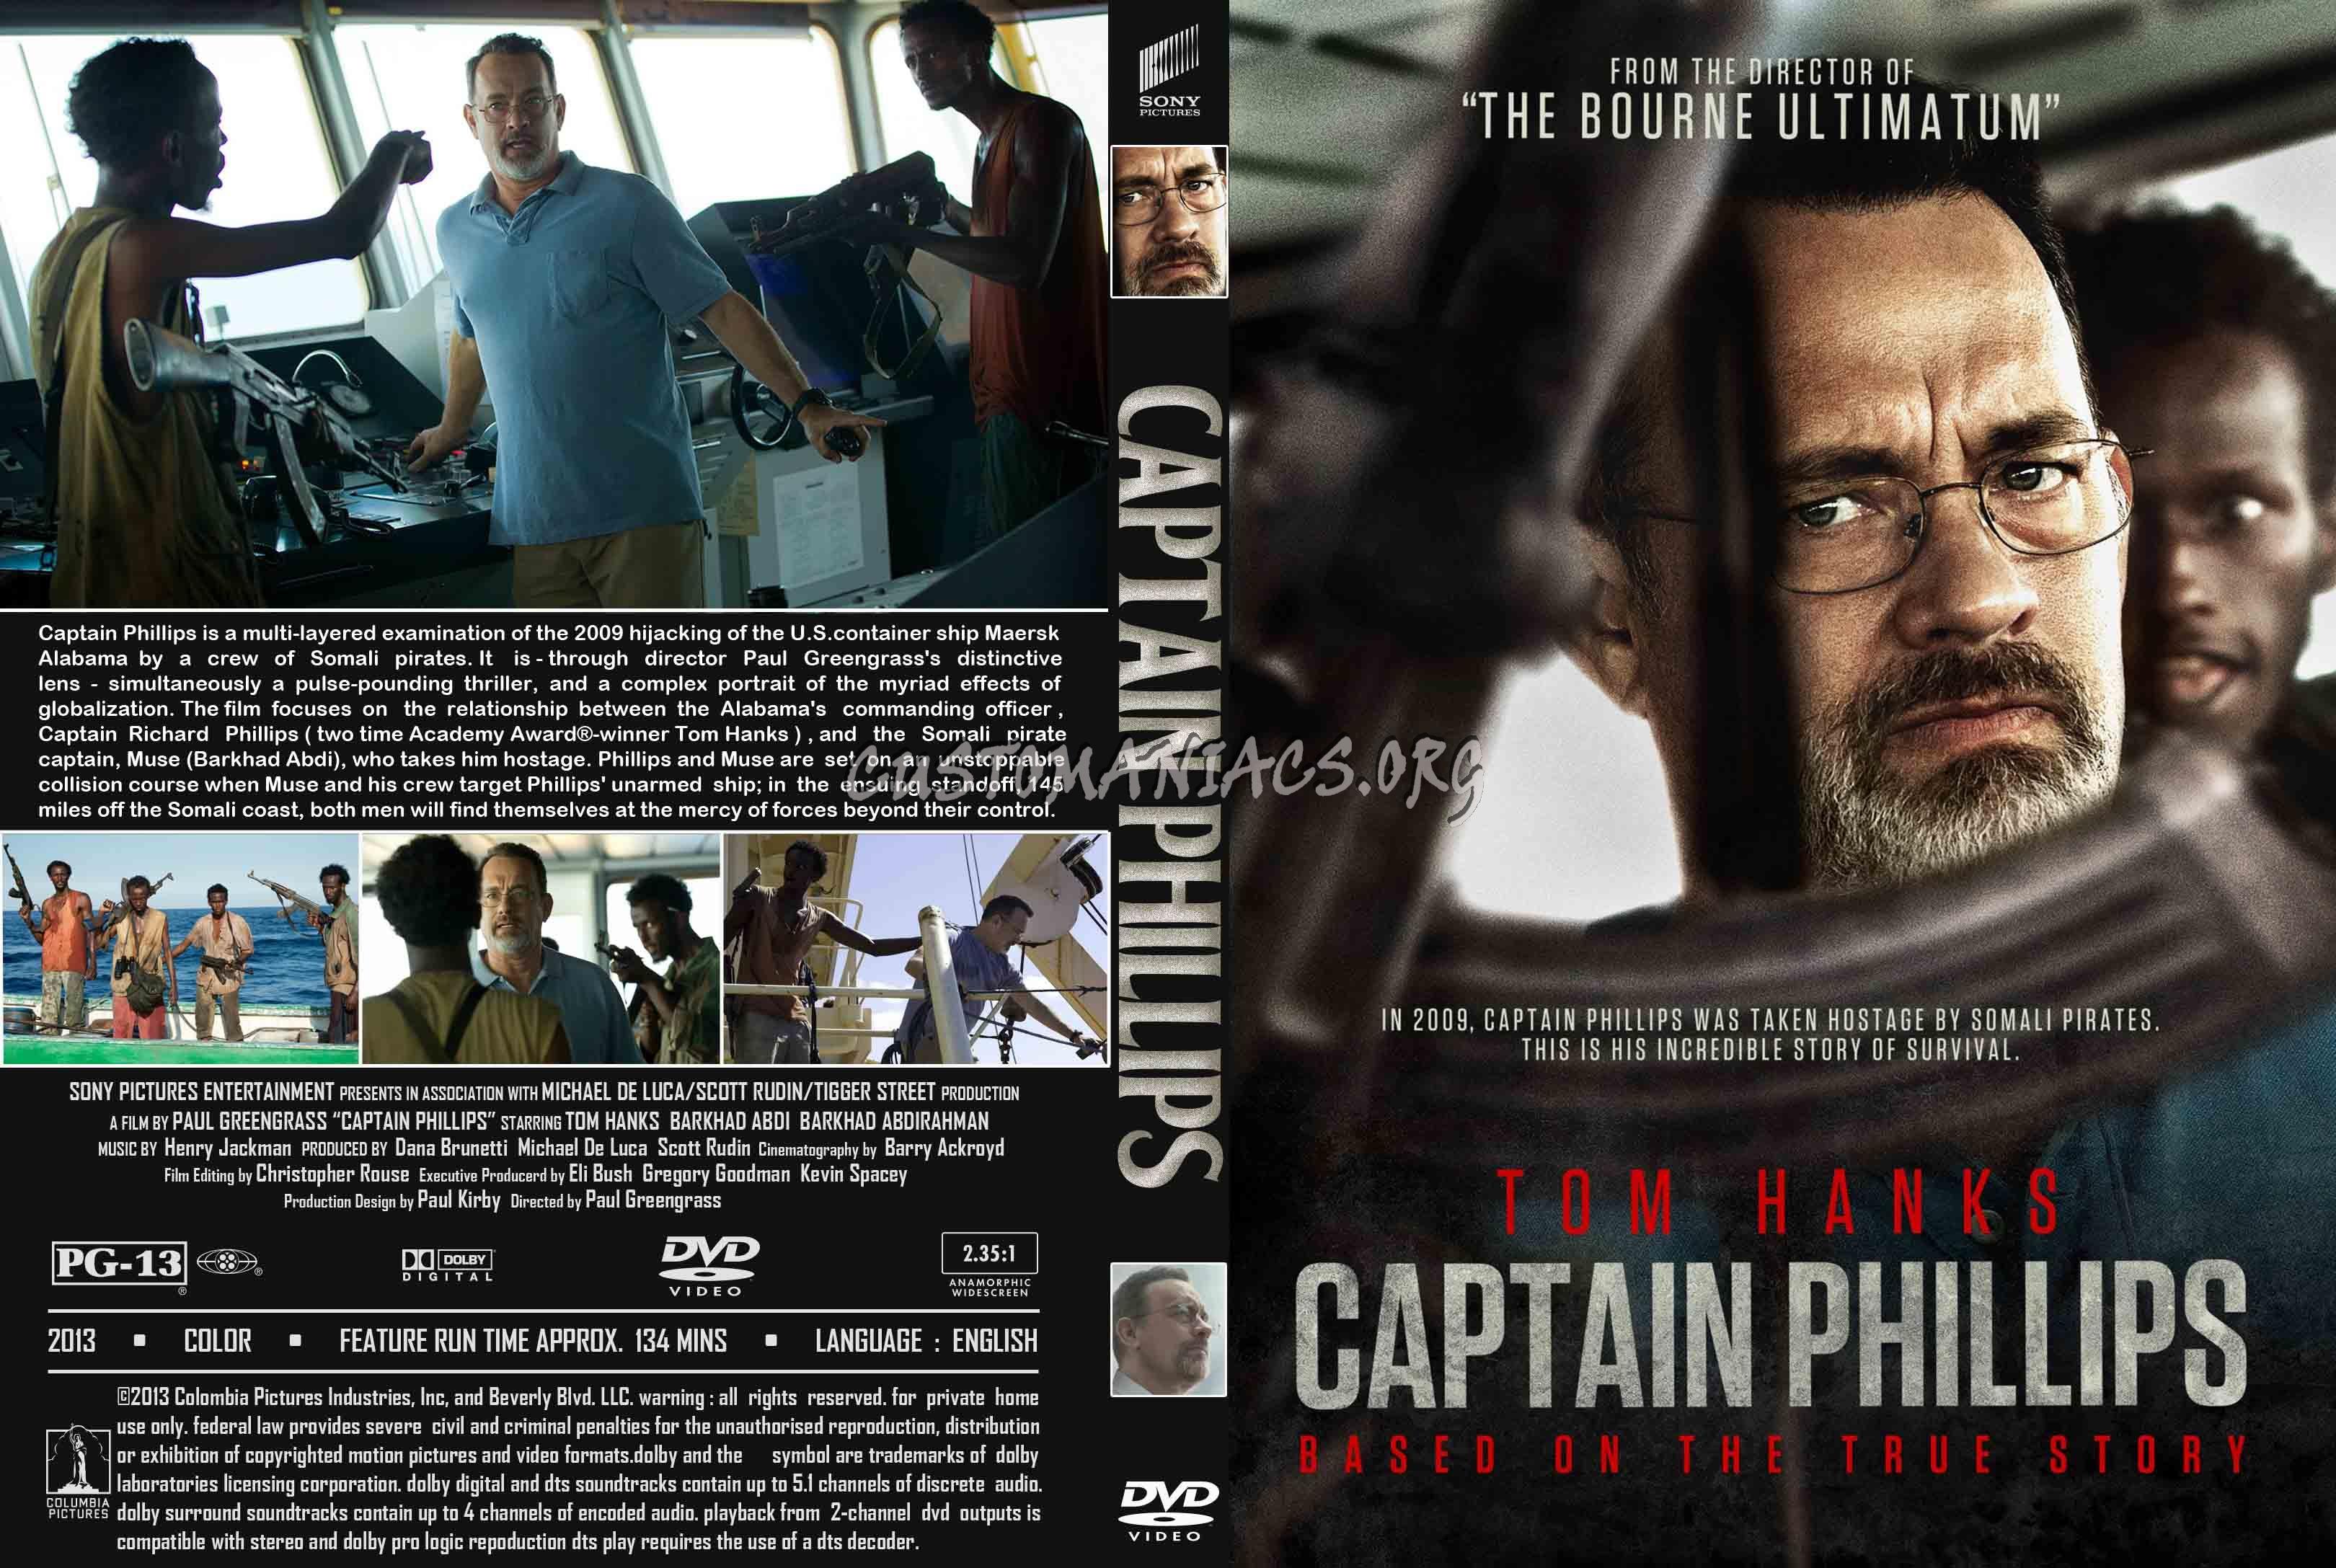 Captain phillips trailer download